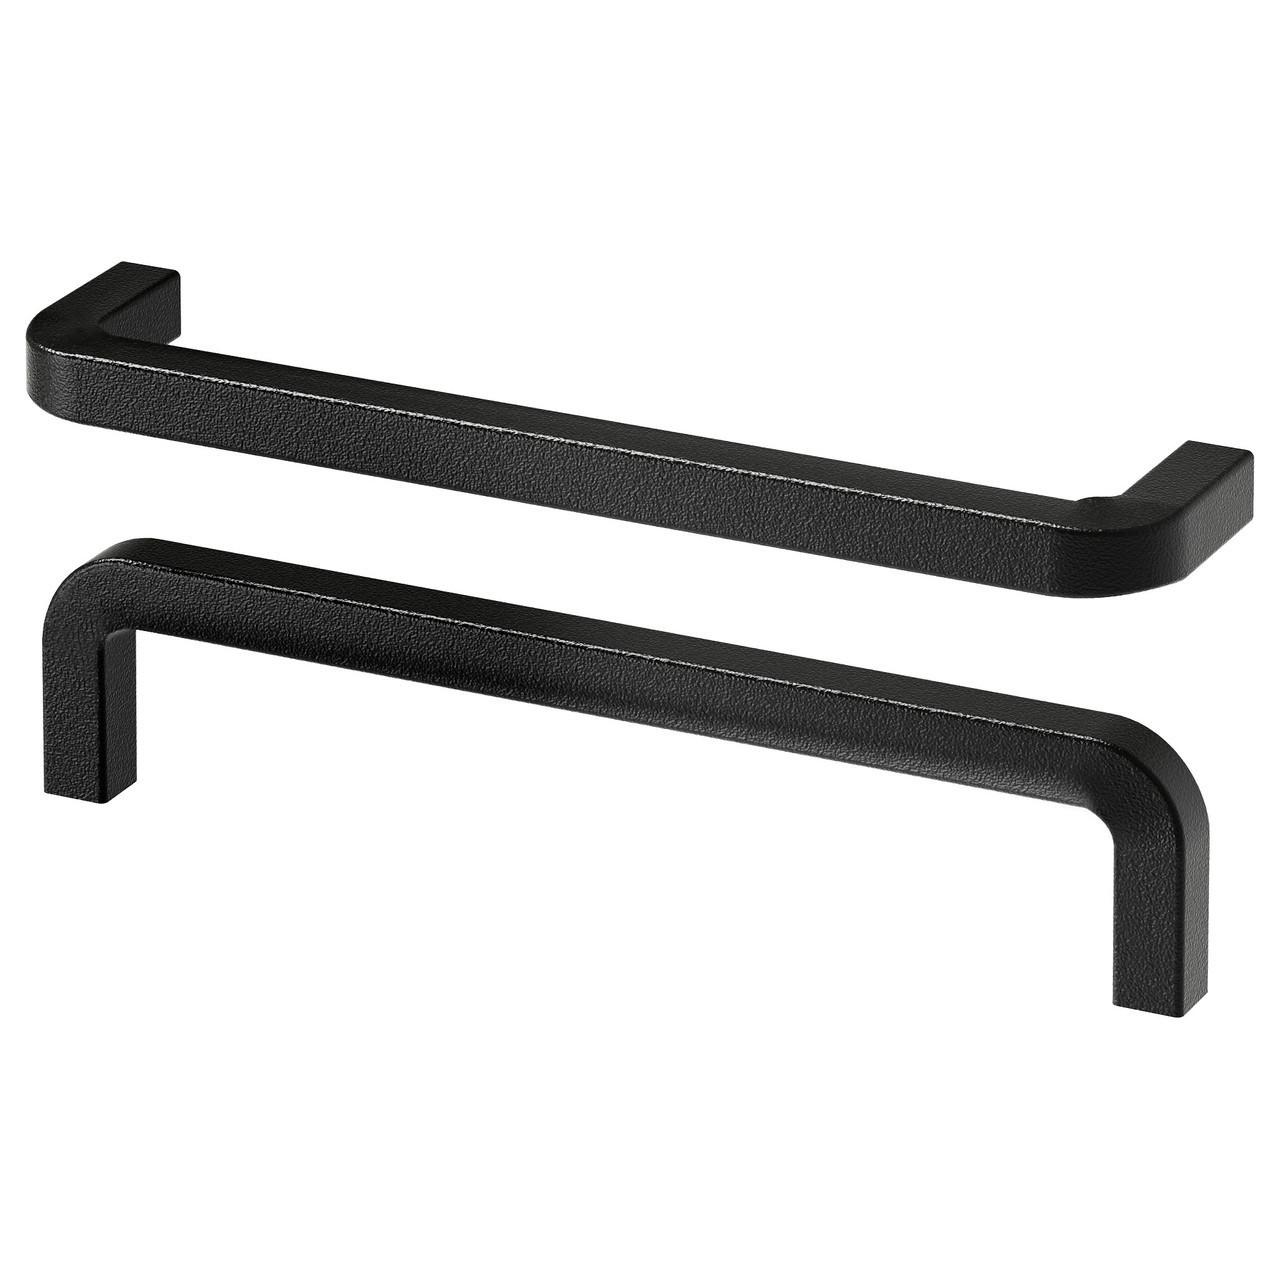 Мебельная ручка IKEA BORGHAMN 2 шт 203.160.46